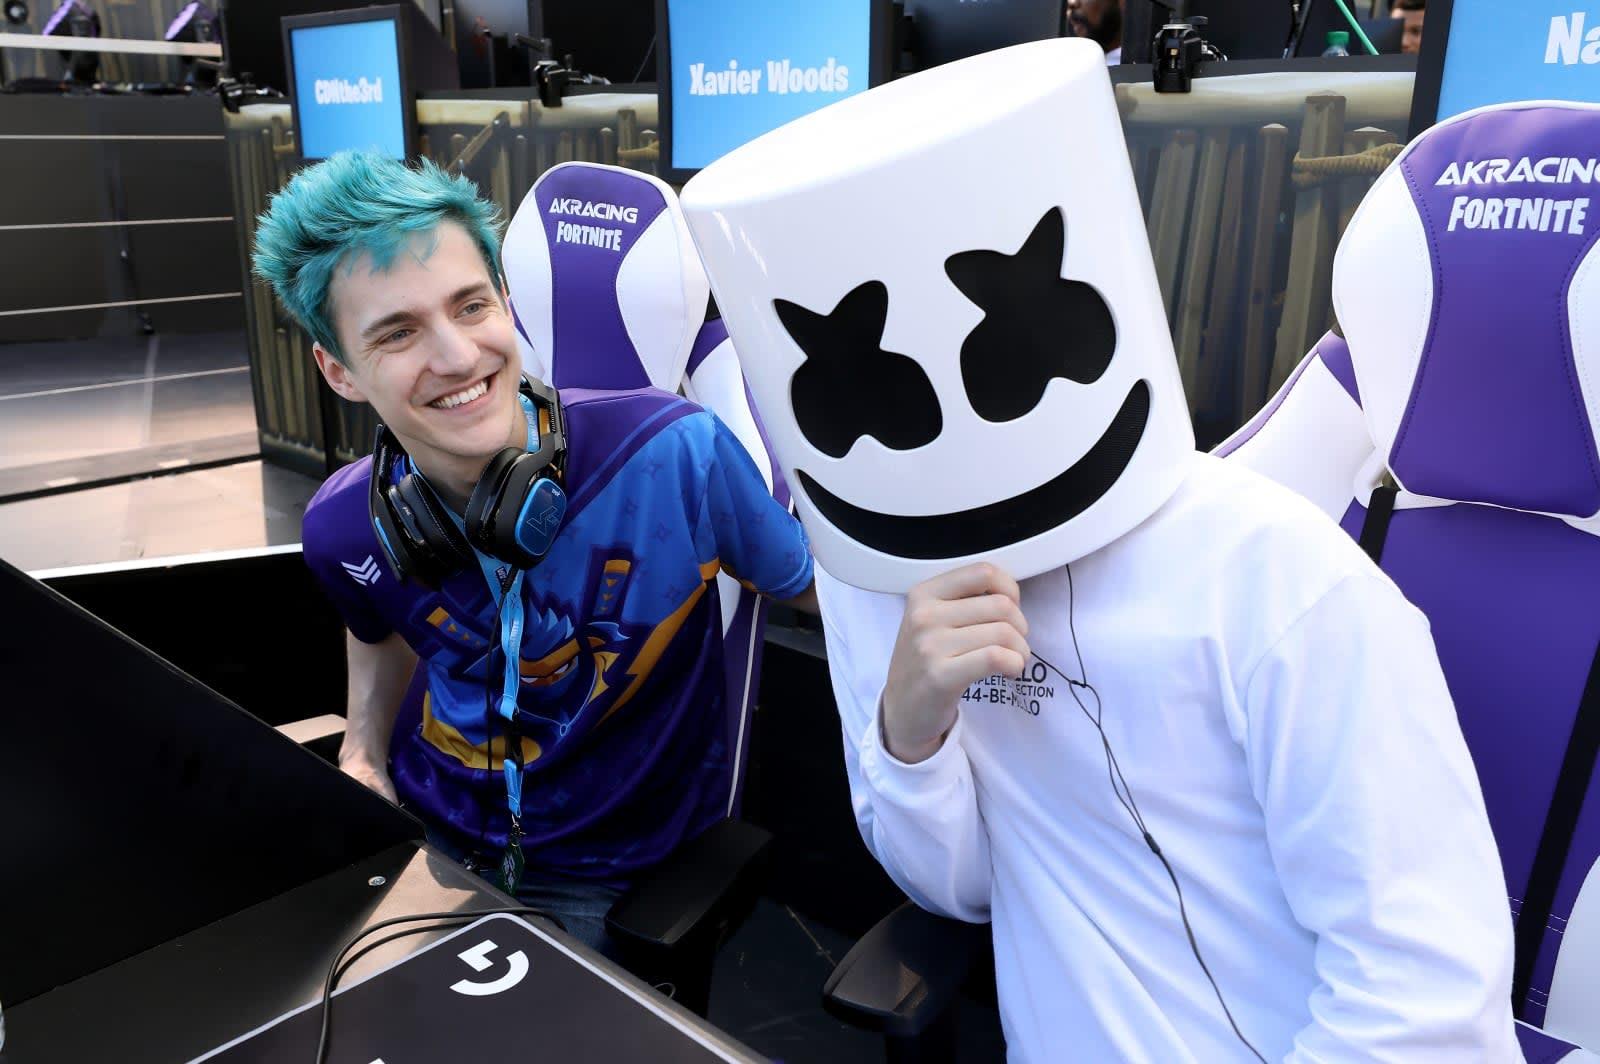 Fortnite' E3 tournament was a taste of its esports future